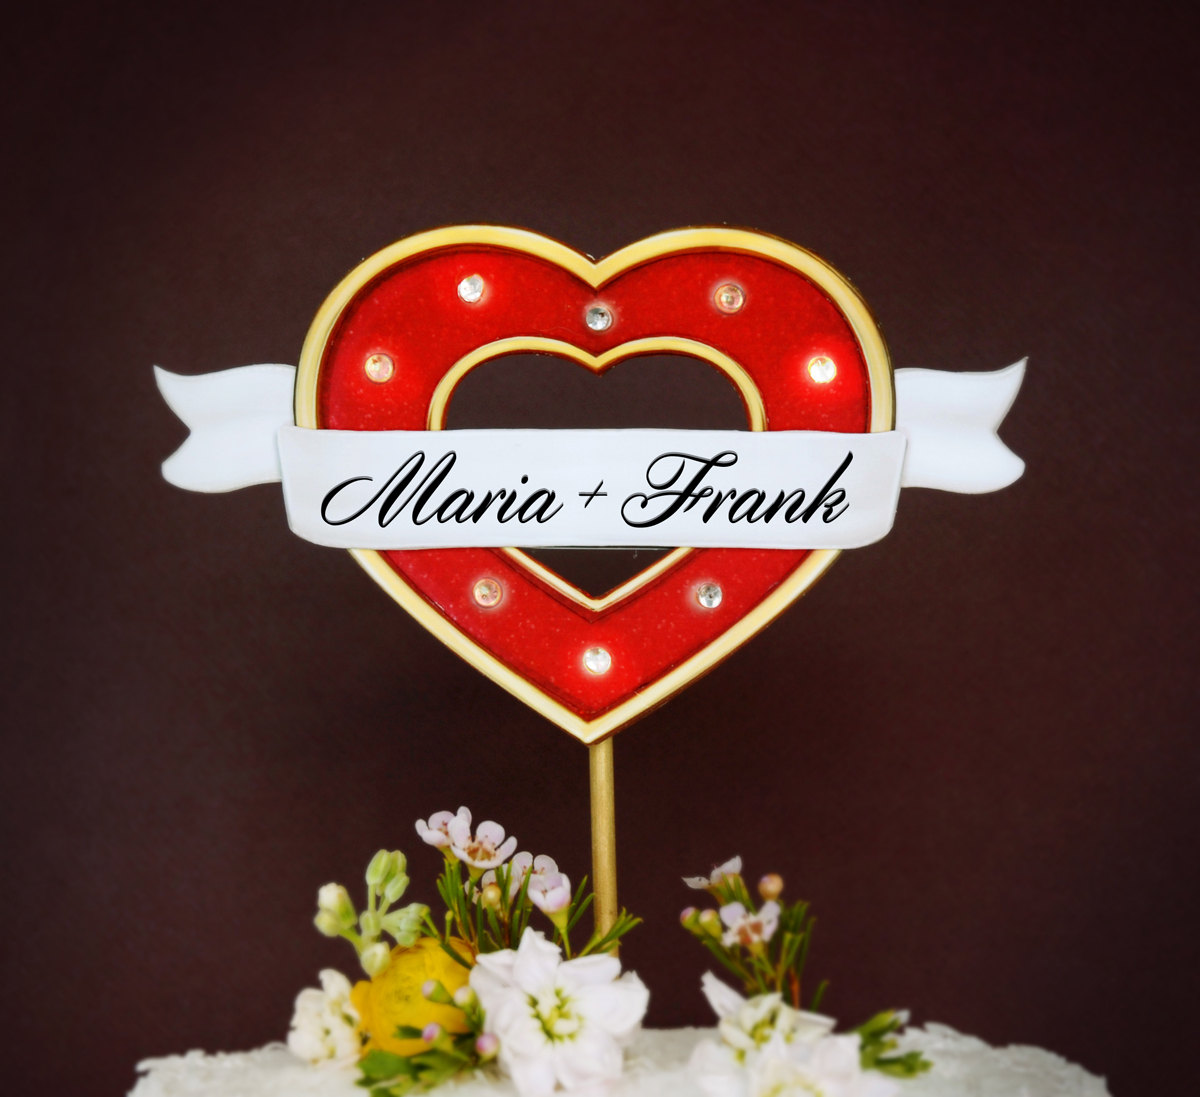 Custom Marquee Lights Wedding Cake Topper with Heart / as seen on www.BrendasWeddingBlog.com